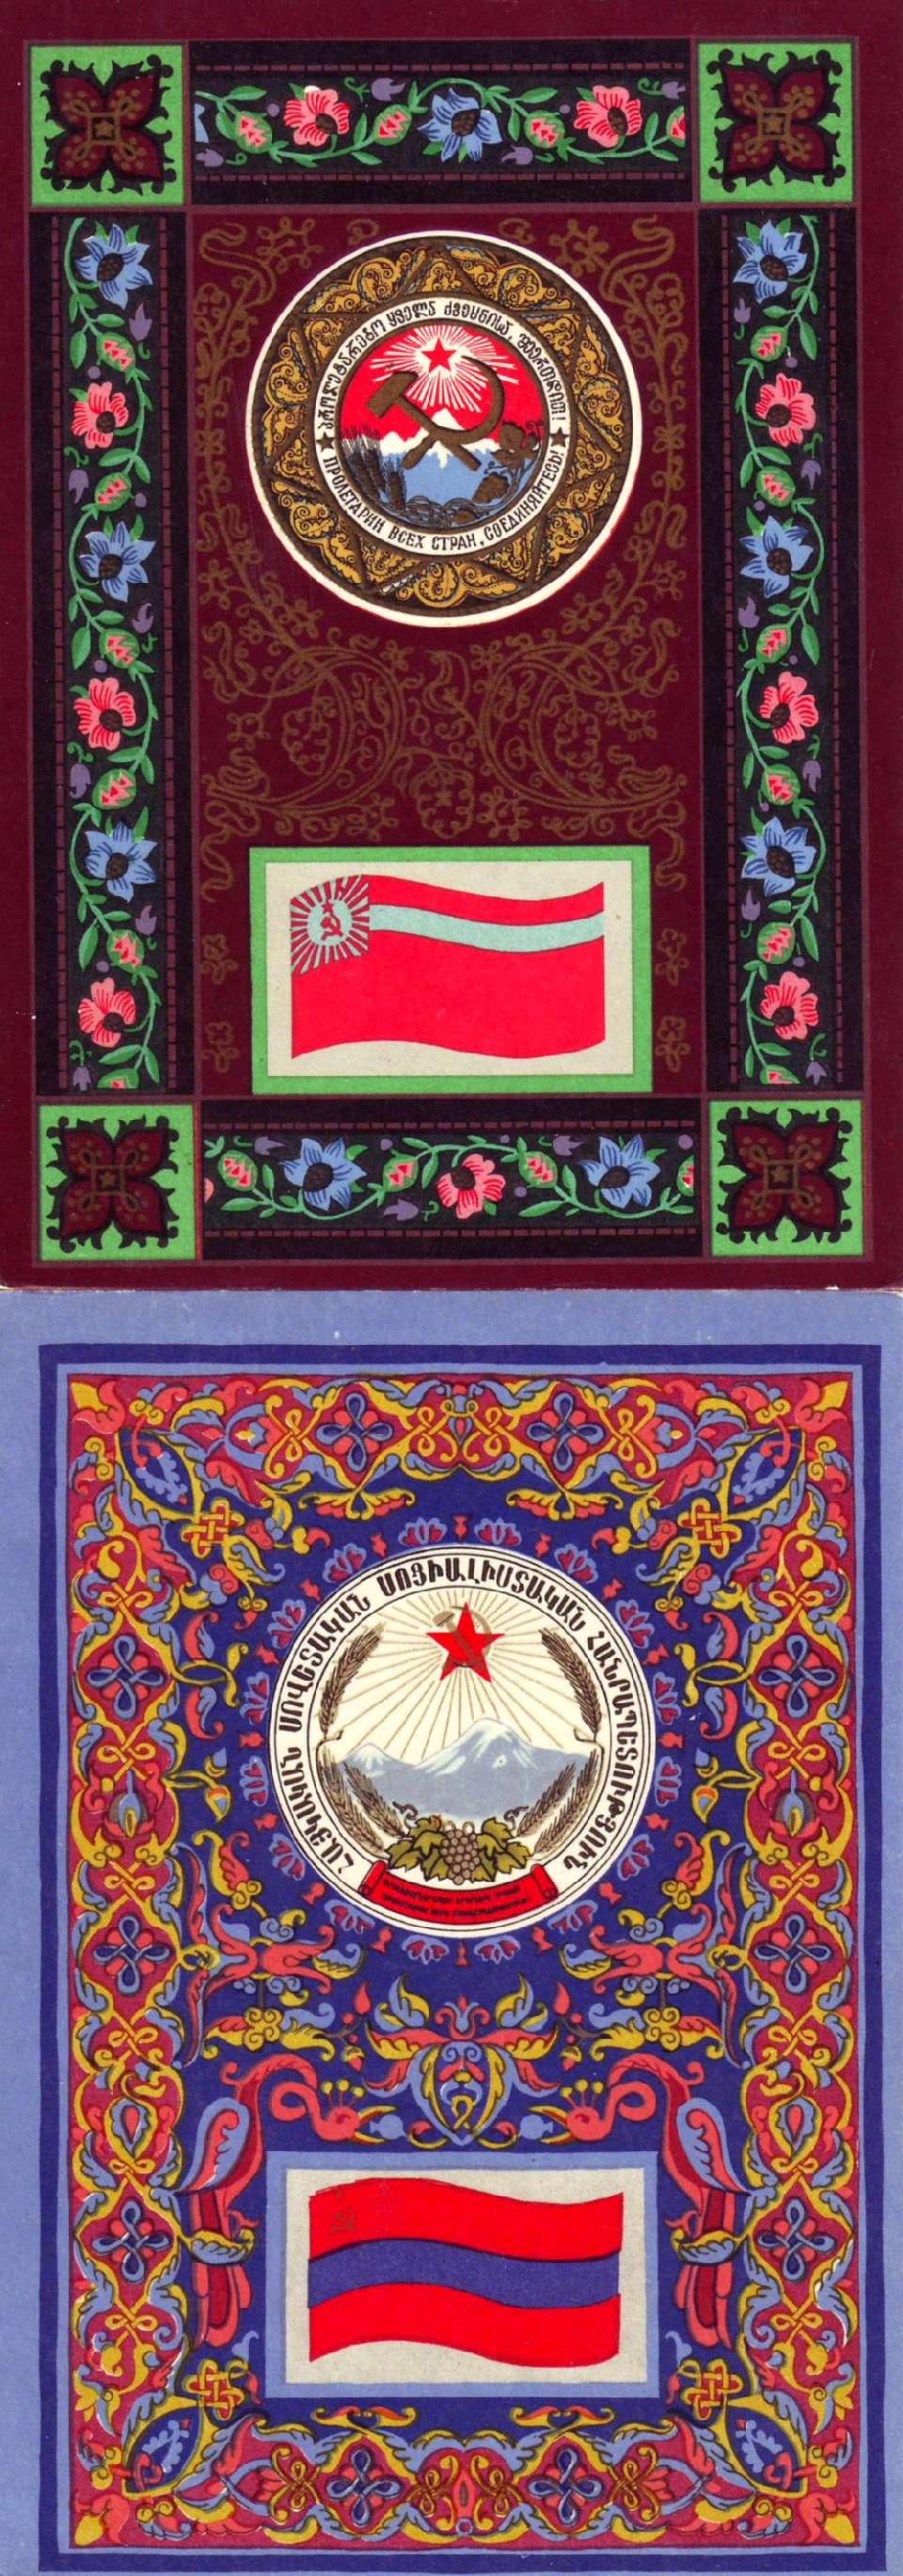 Набор lt b gt открыток lt b gt lt b gt гербы lt b gt и флаги ссср